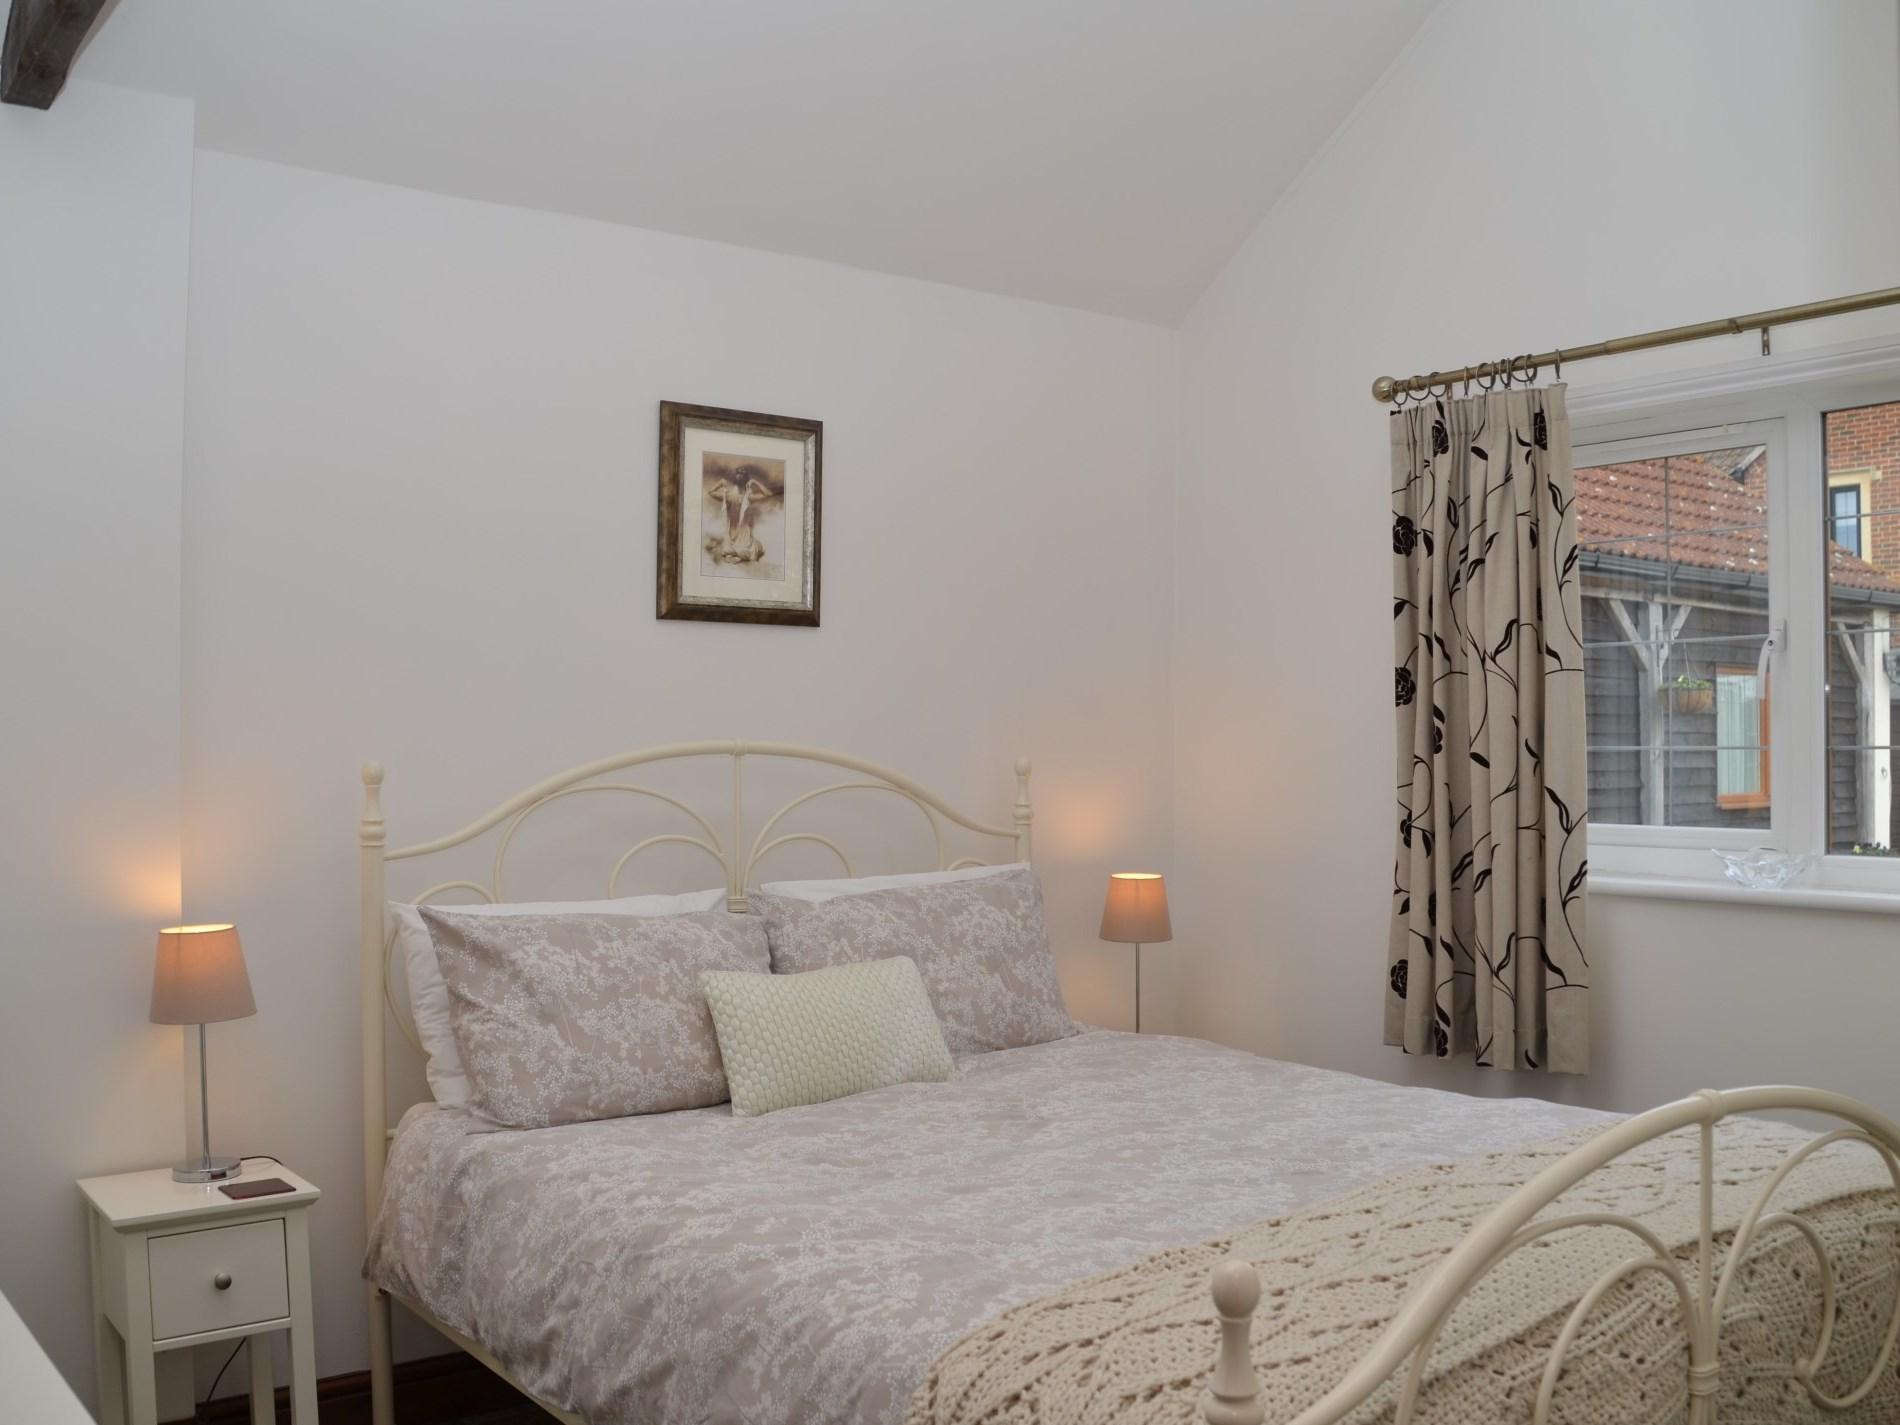 Stylish king-size bedroom